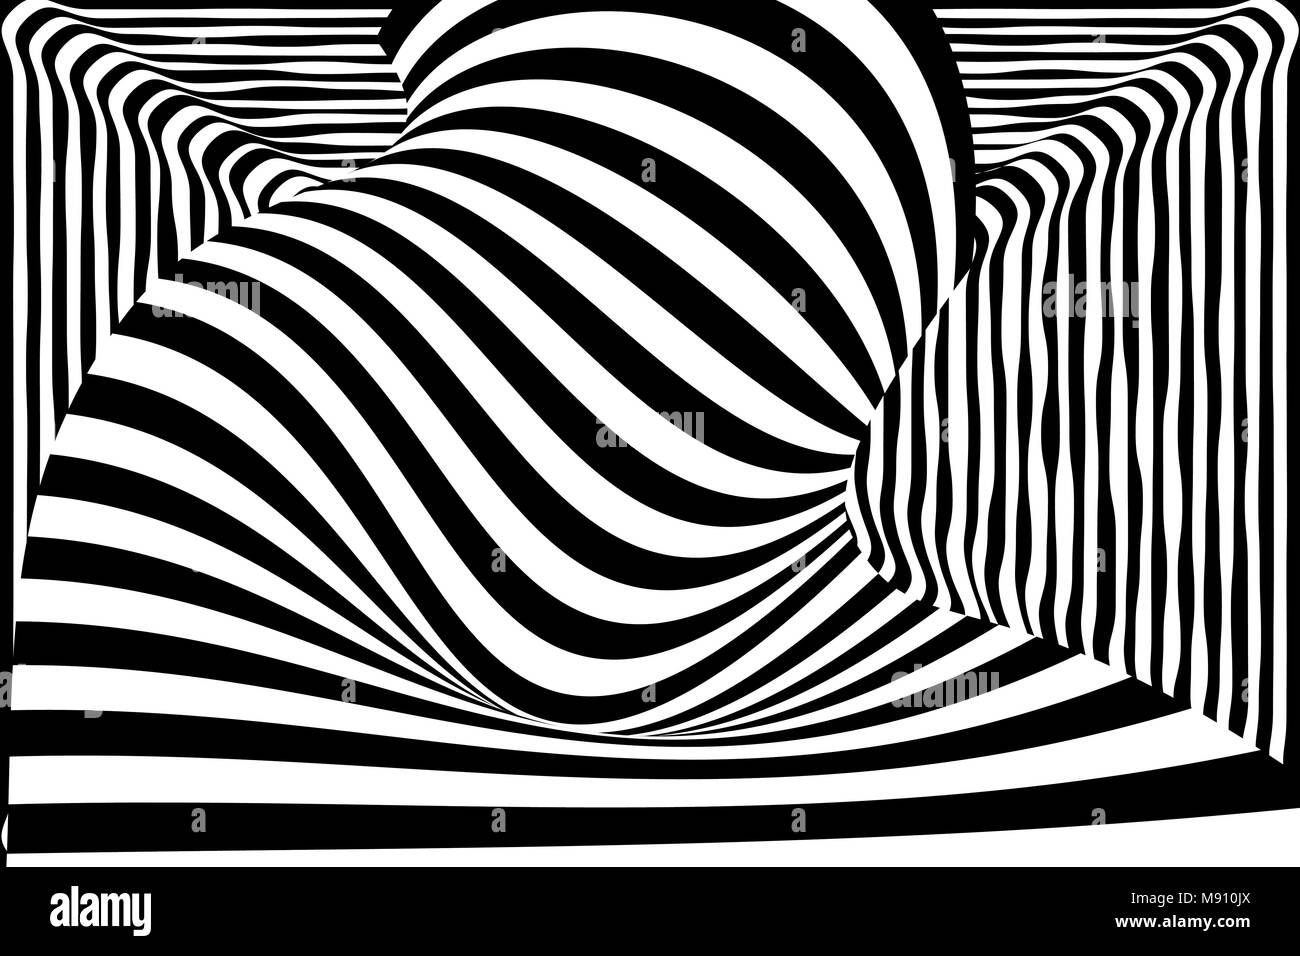 Black white 3d line distortion illusion - Stock Image